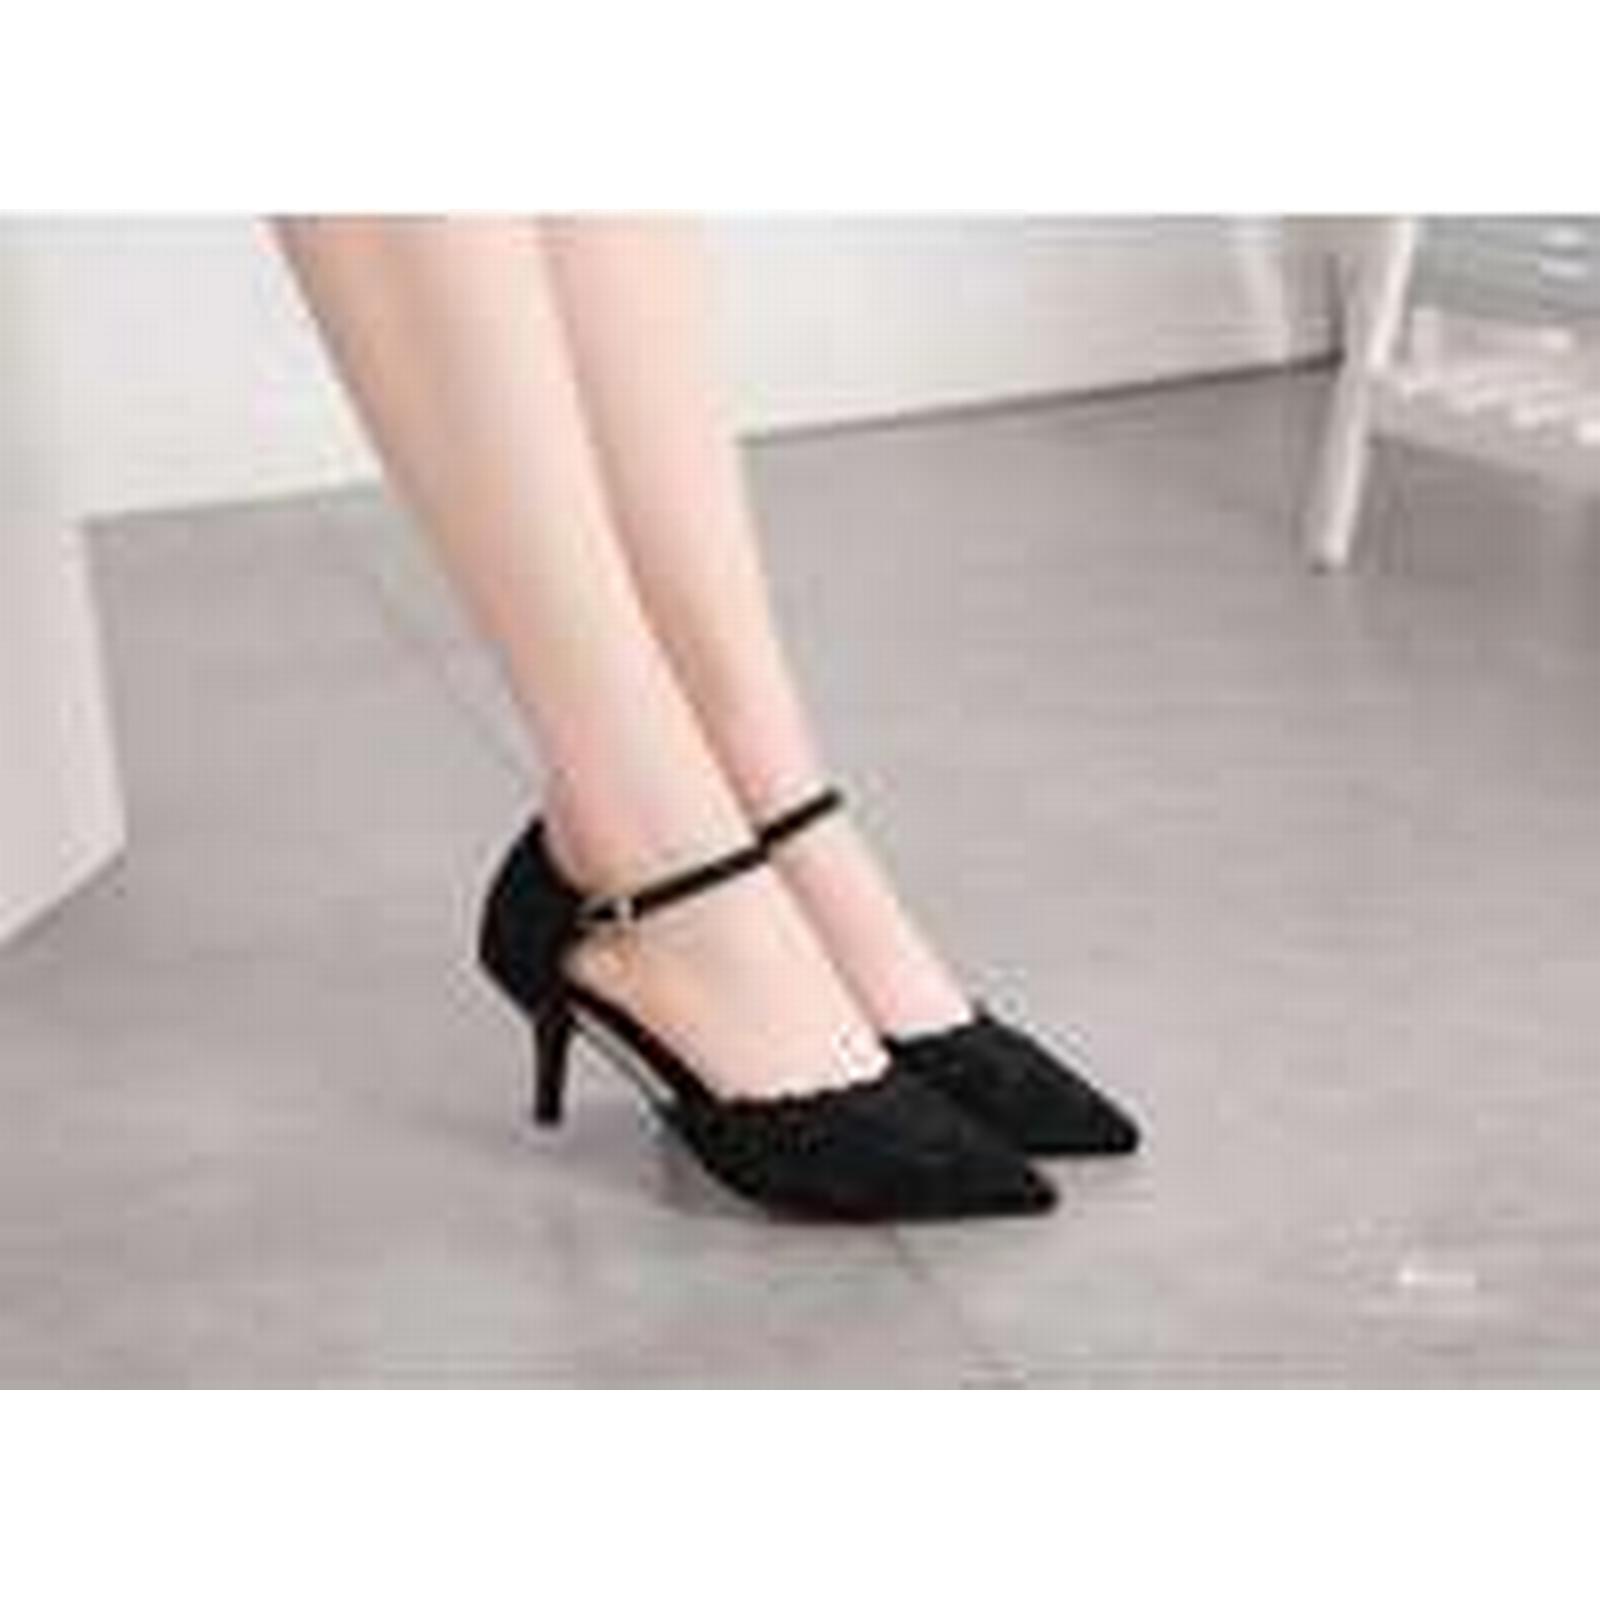 Bonanza (Global) ps336 creative rhinestones 4-8,black pointy sandals,hollow body,US Size 4-8,black rhinestones 46740c